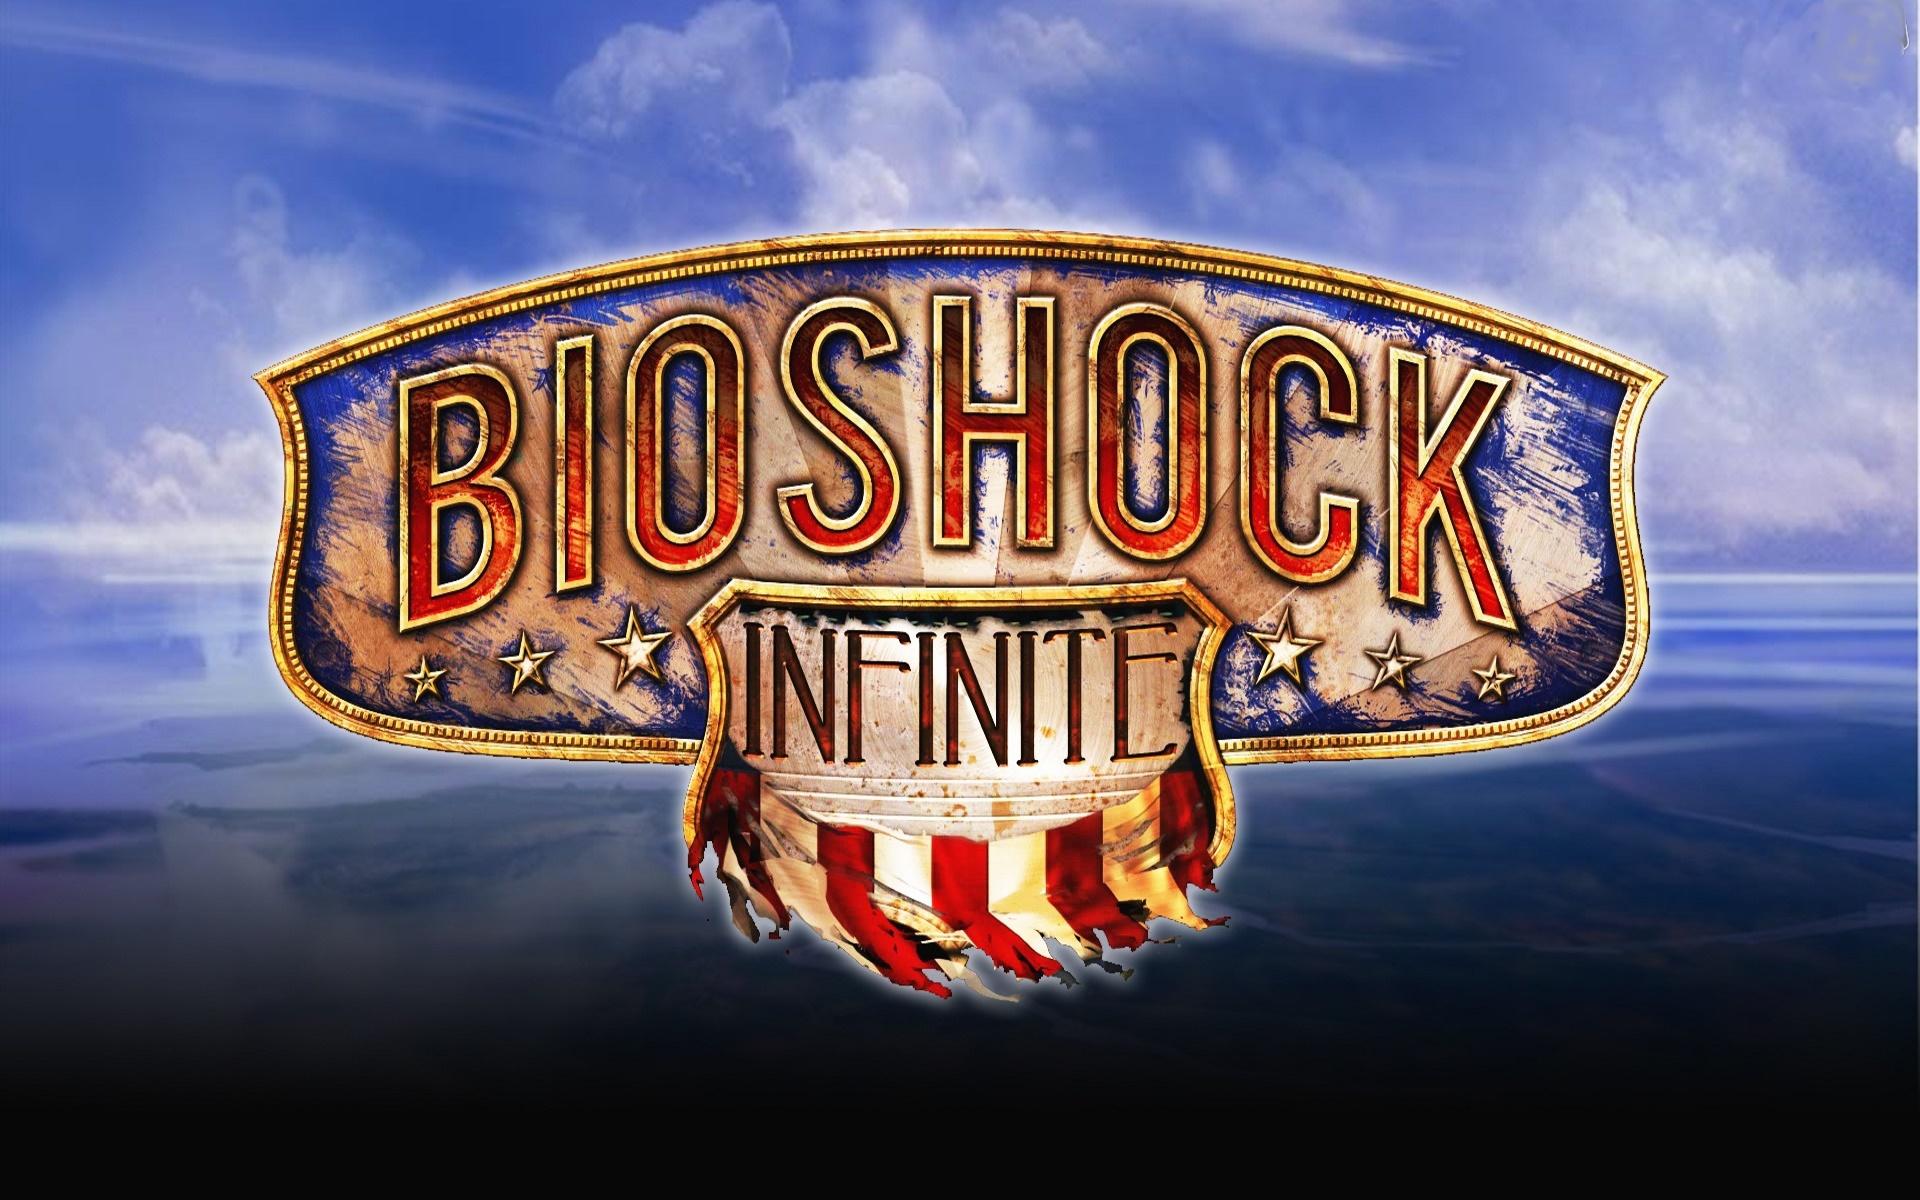 BioshockInfinite